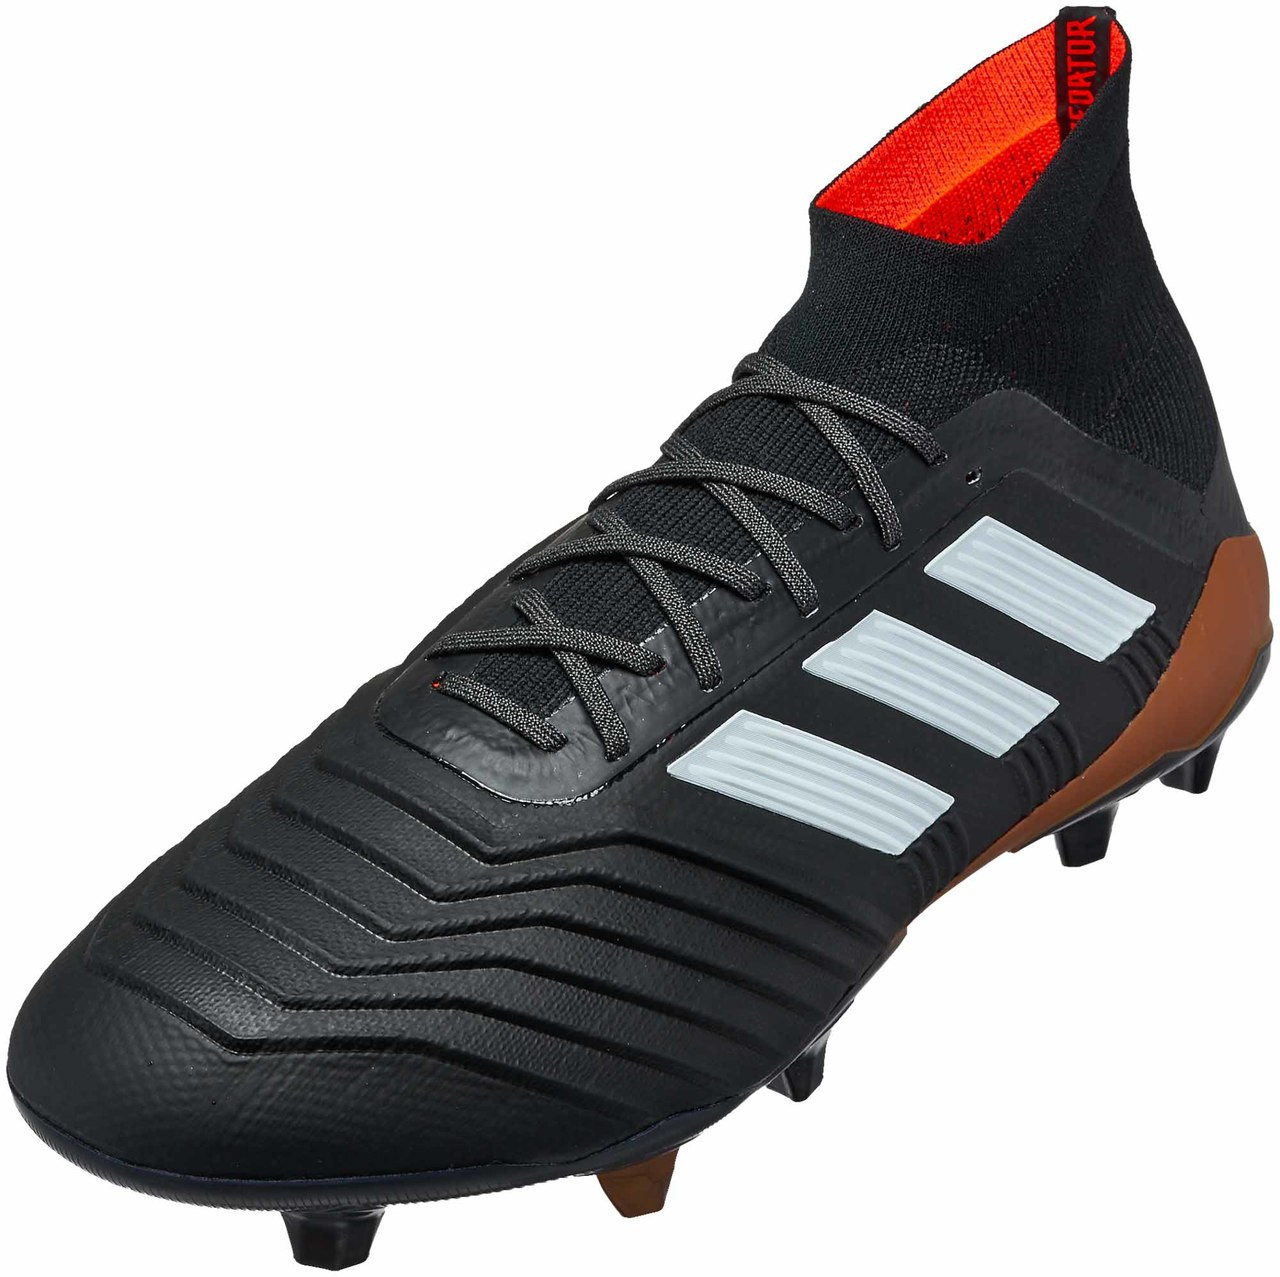 be80c5c11b42 Adidas Predator 18.1 FG - Black White Solar Red (111617) - ohp soccer